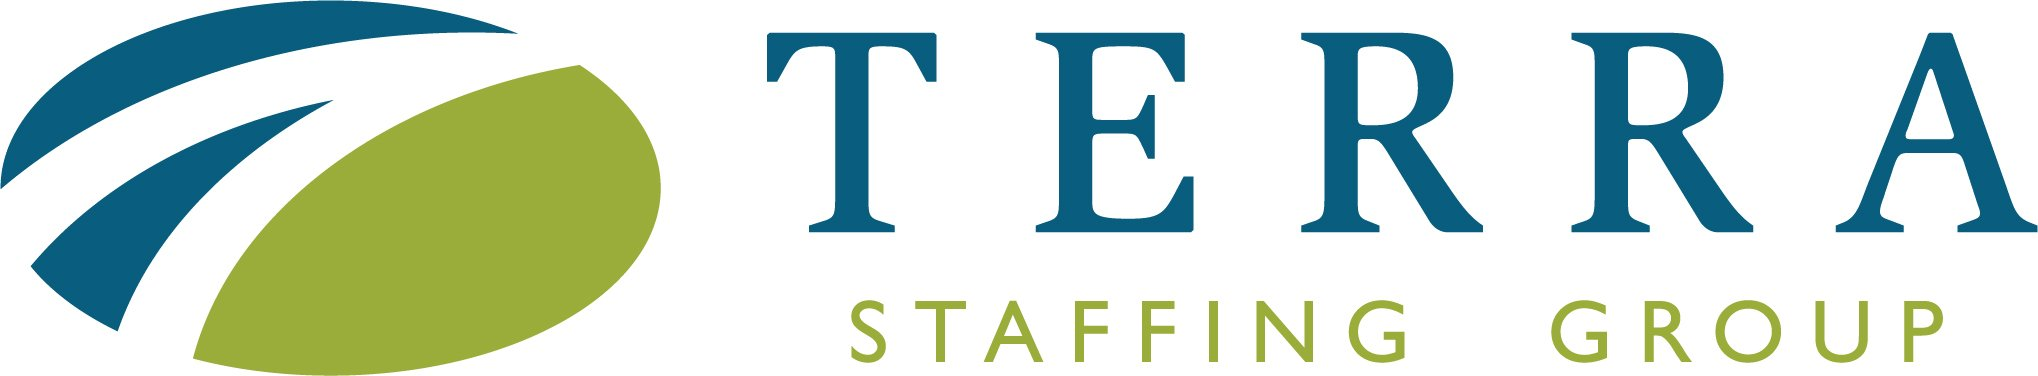 Human Resources Generalist – TERRA Staffing Group